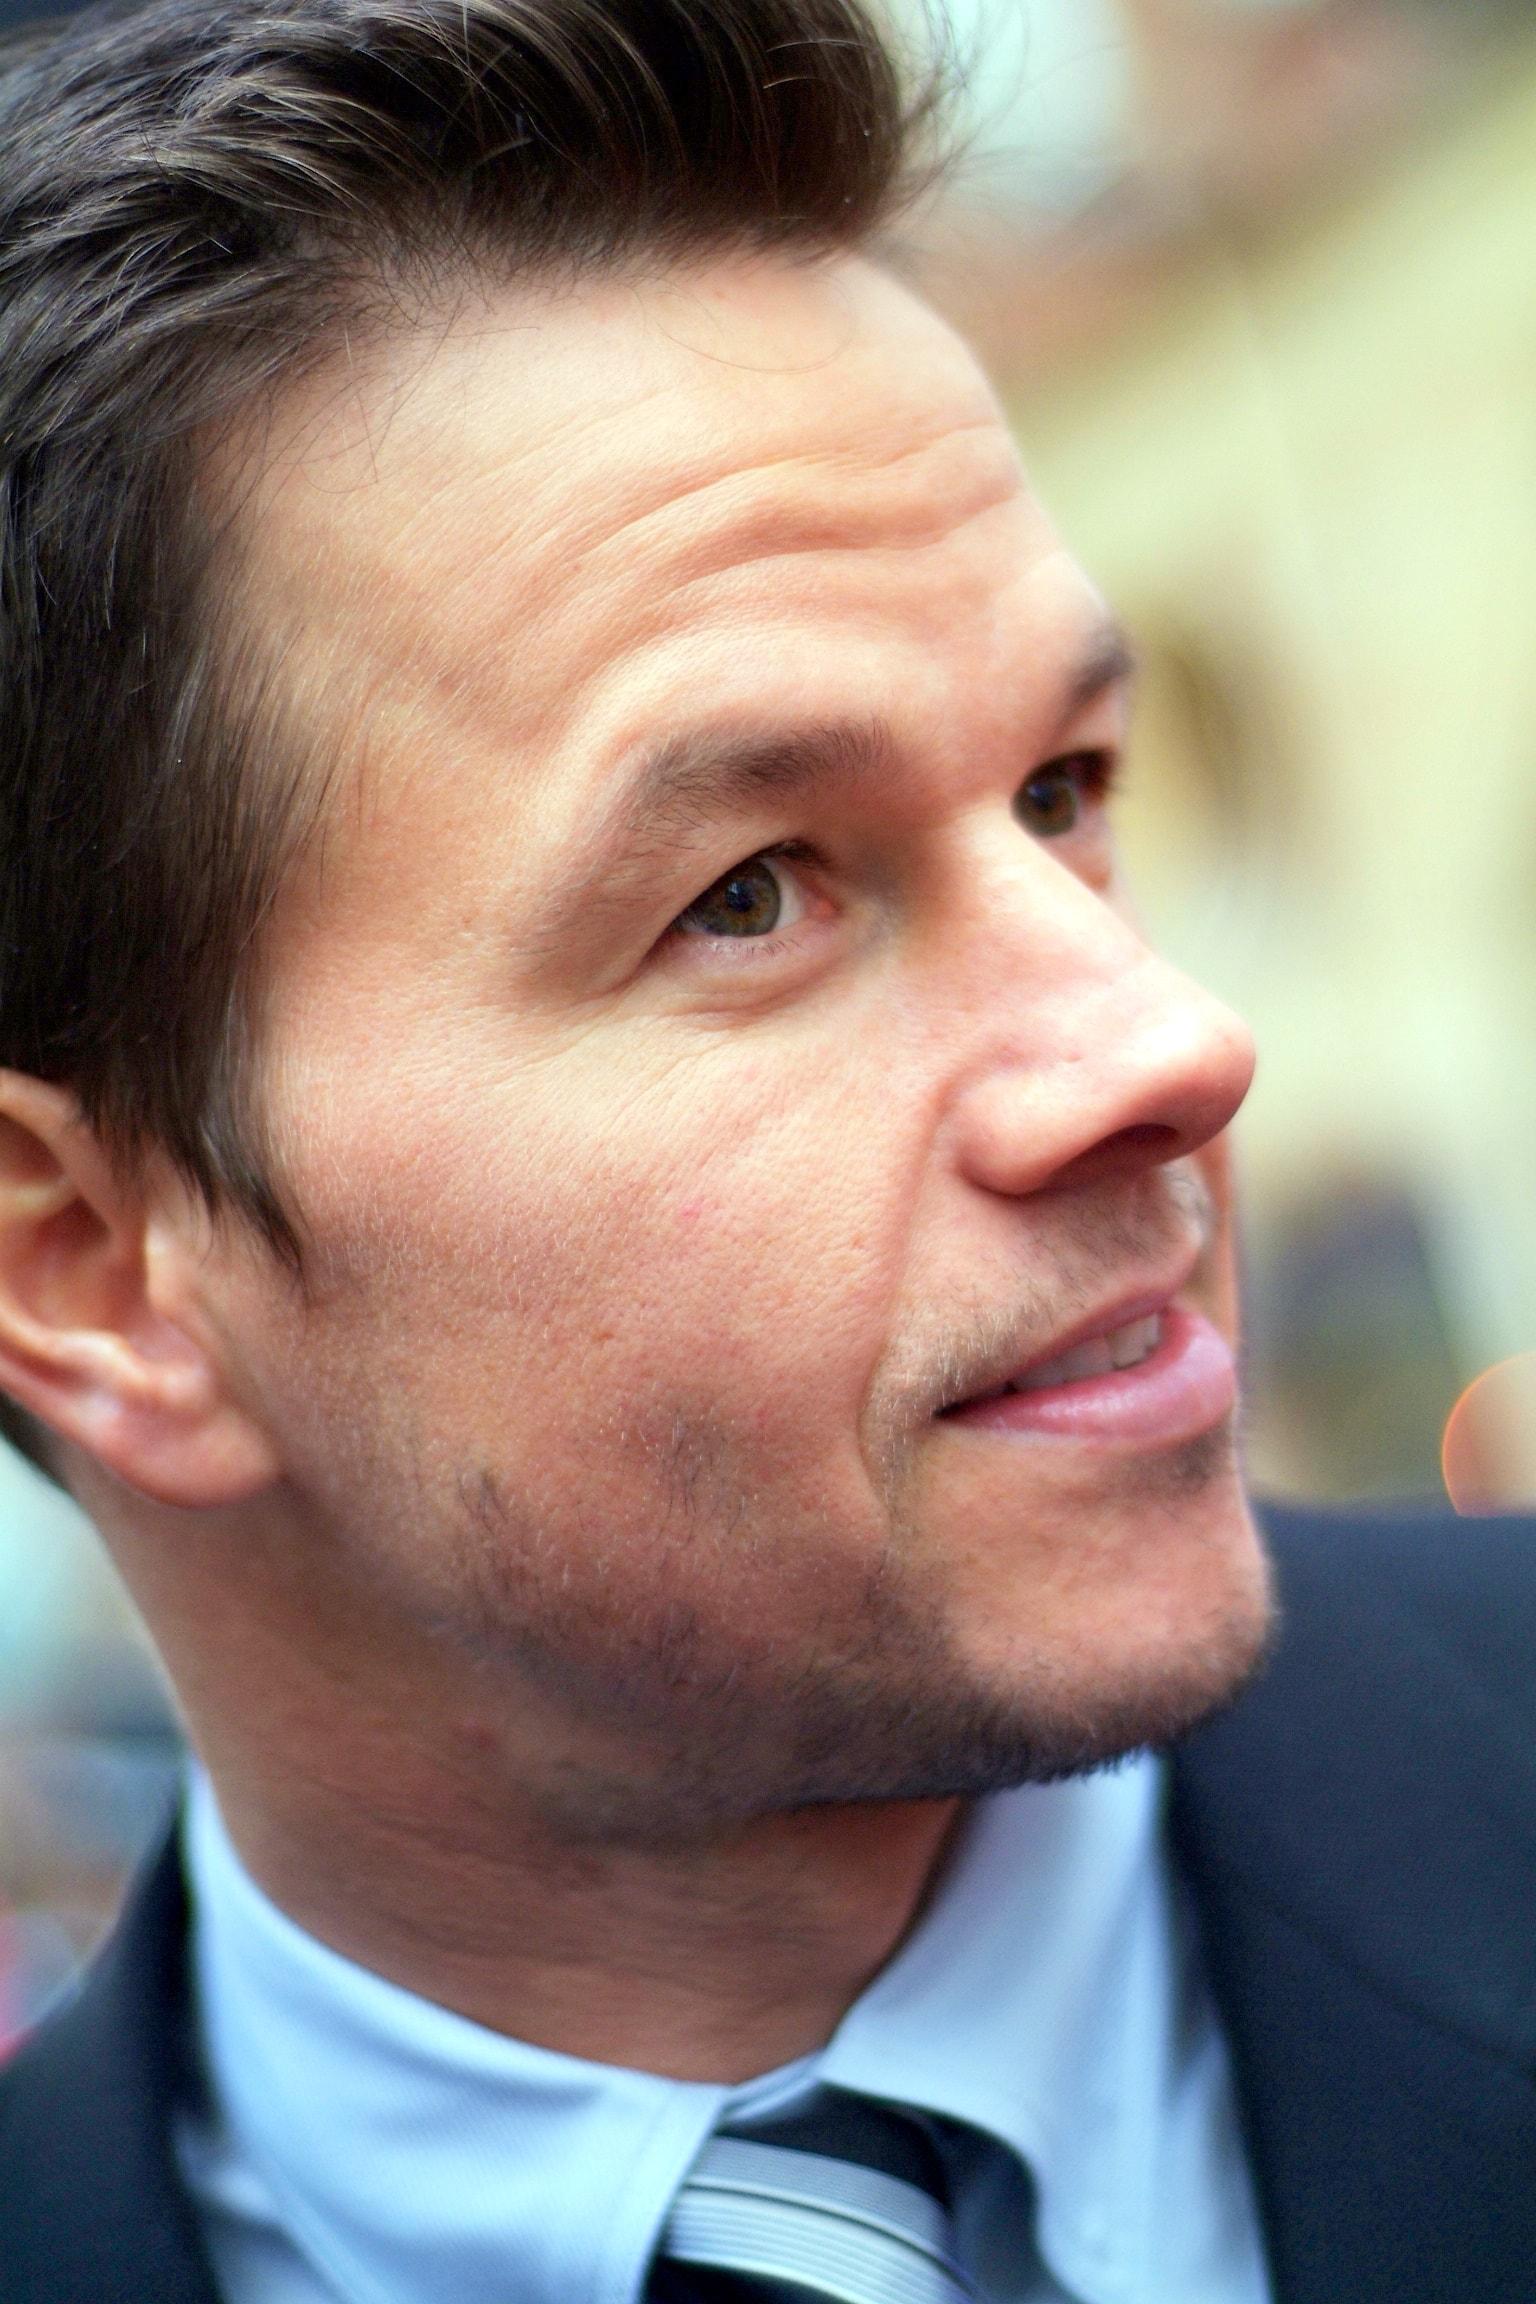 Mark Wahlberg For mobile